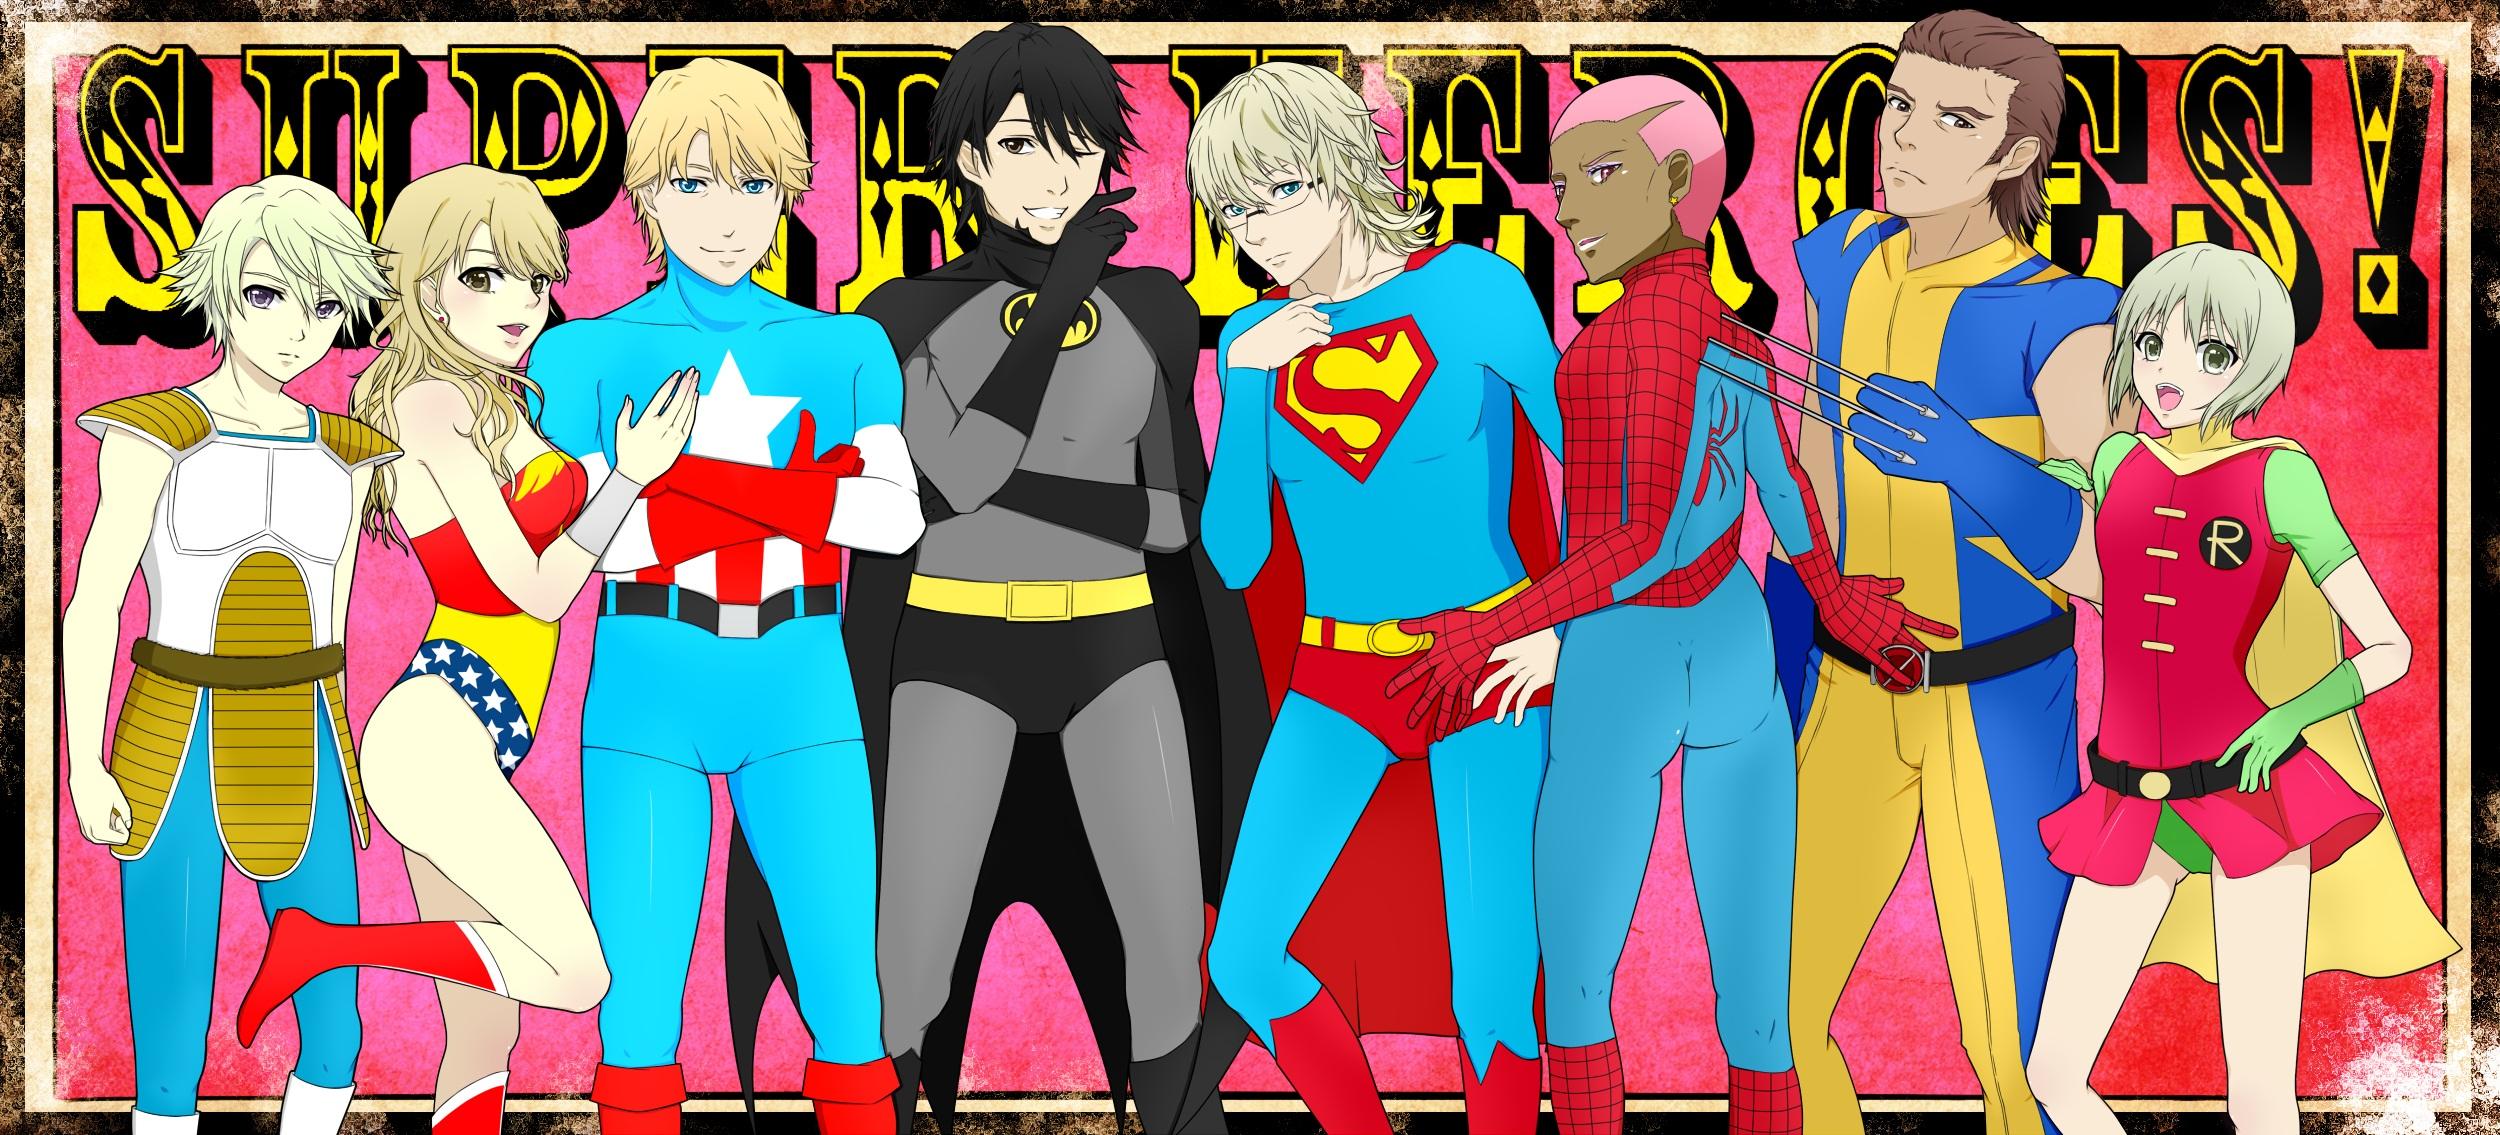 TIGER & BUNNY Image #669418 - Zerochan Anime Image Board